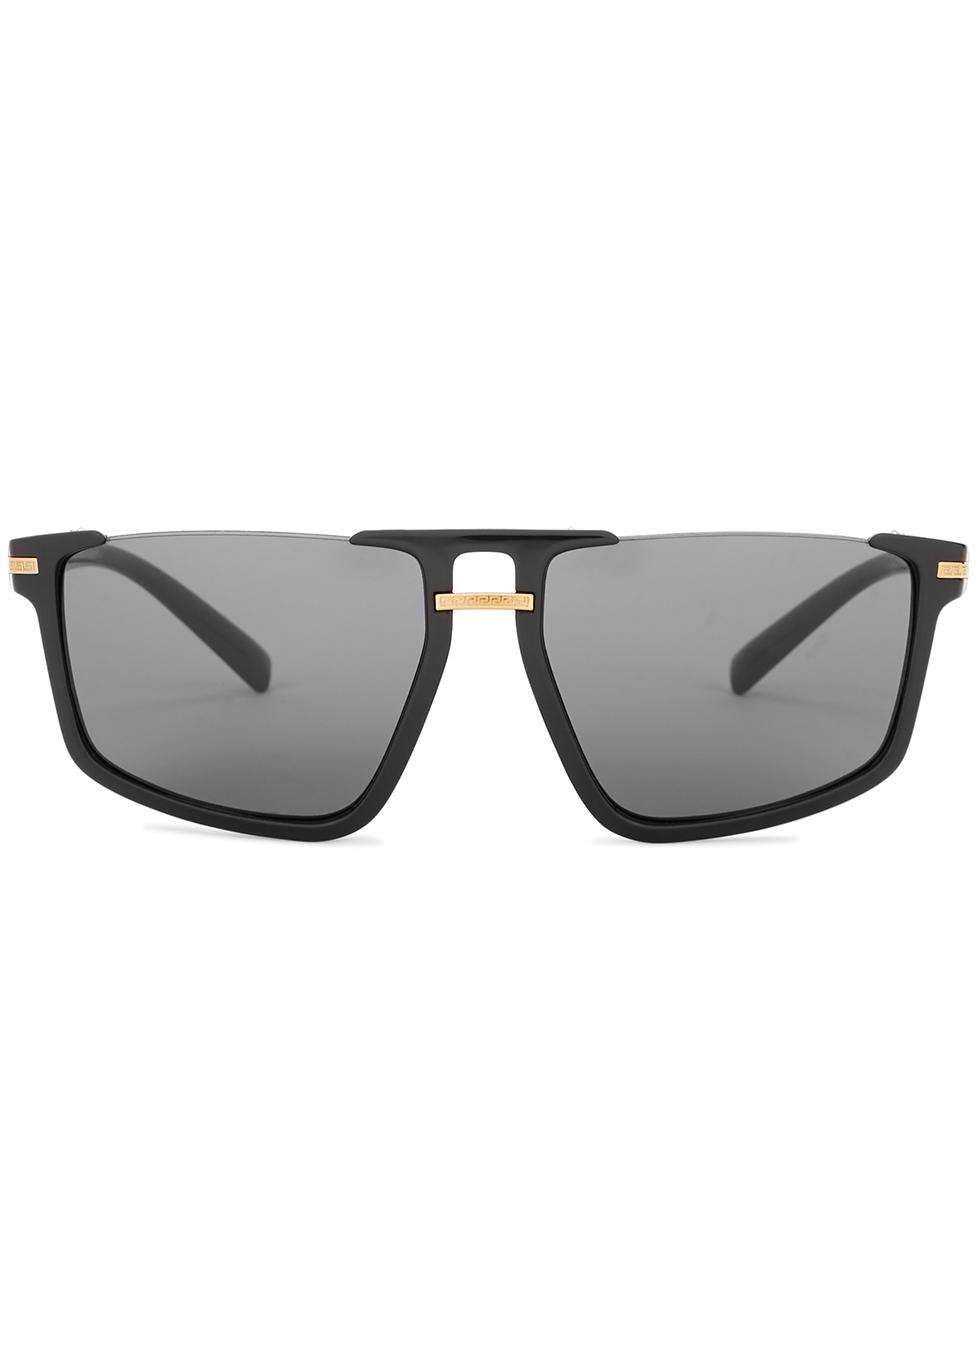 Black wayfarer-style sunglasses - Versace